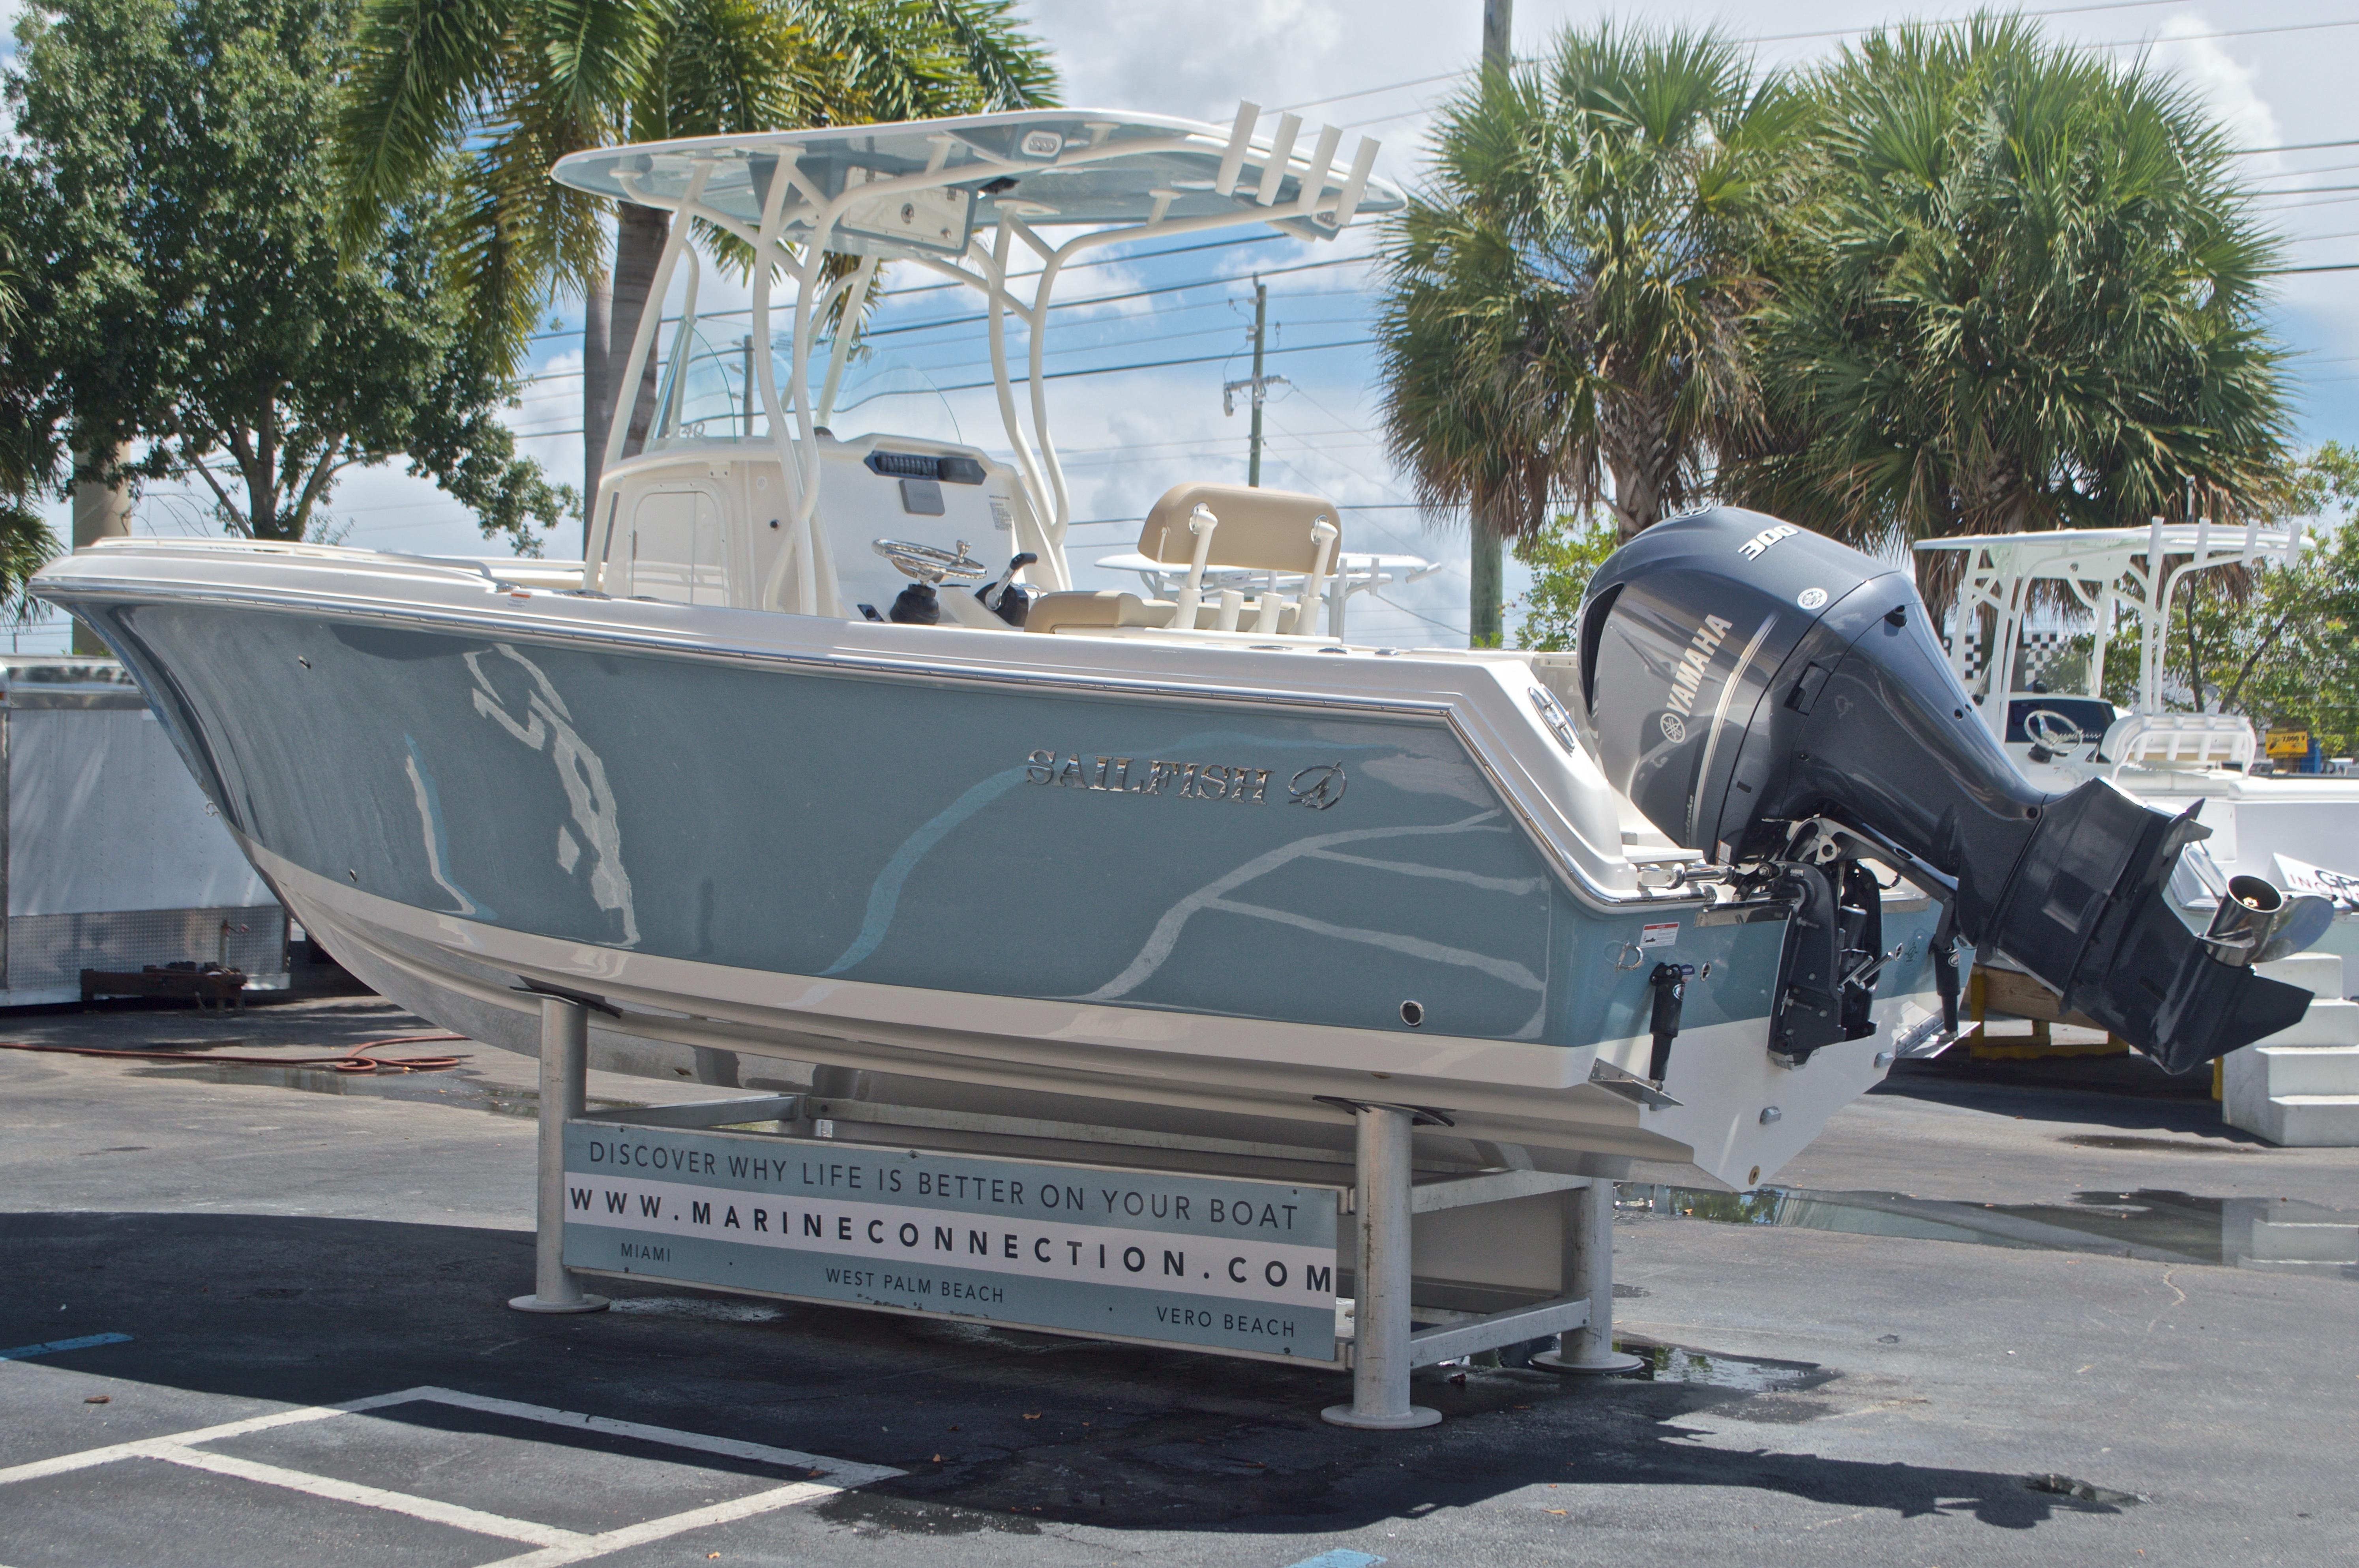 Thumbnail 5 for New 2017 Sailfish 240 CC Center Console boat for sale in Miami, FL